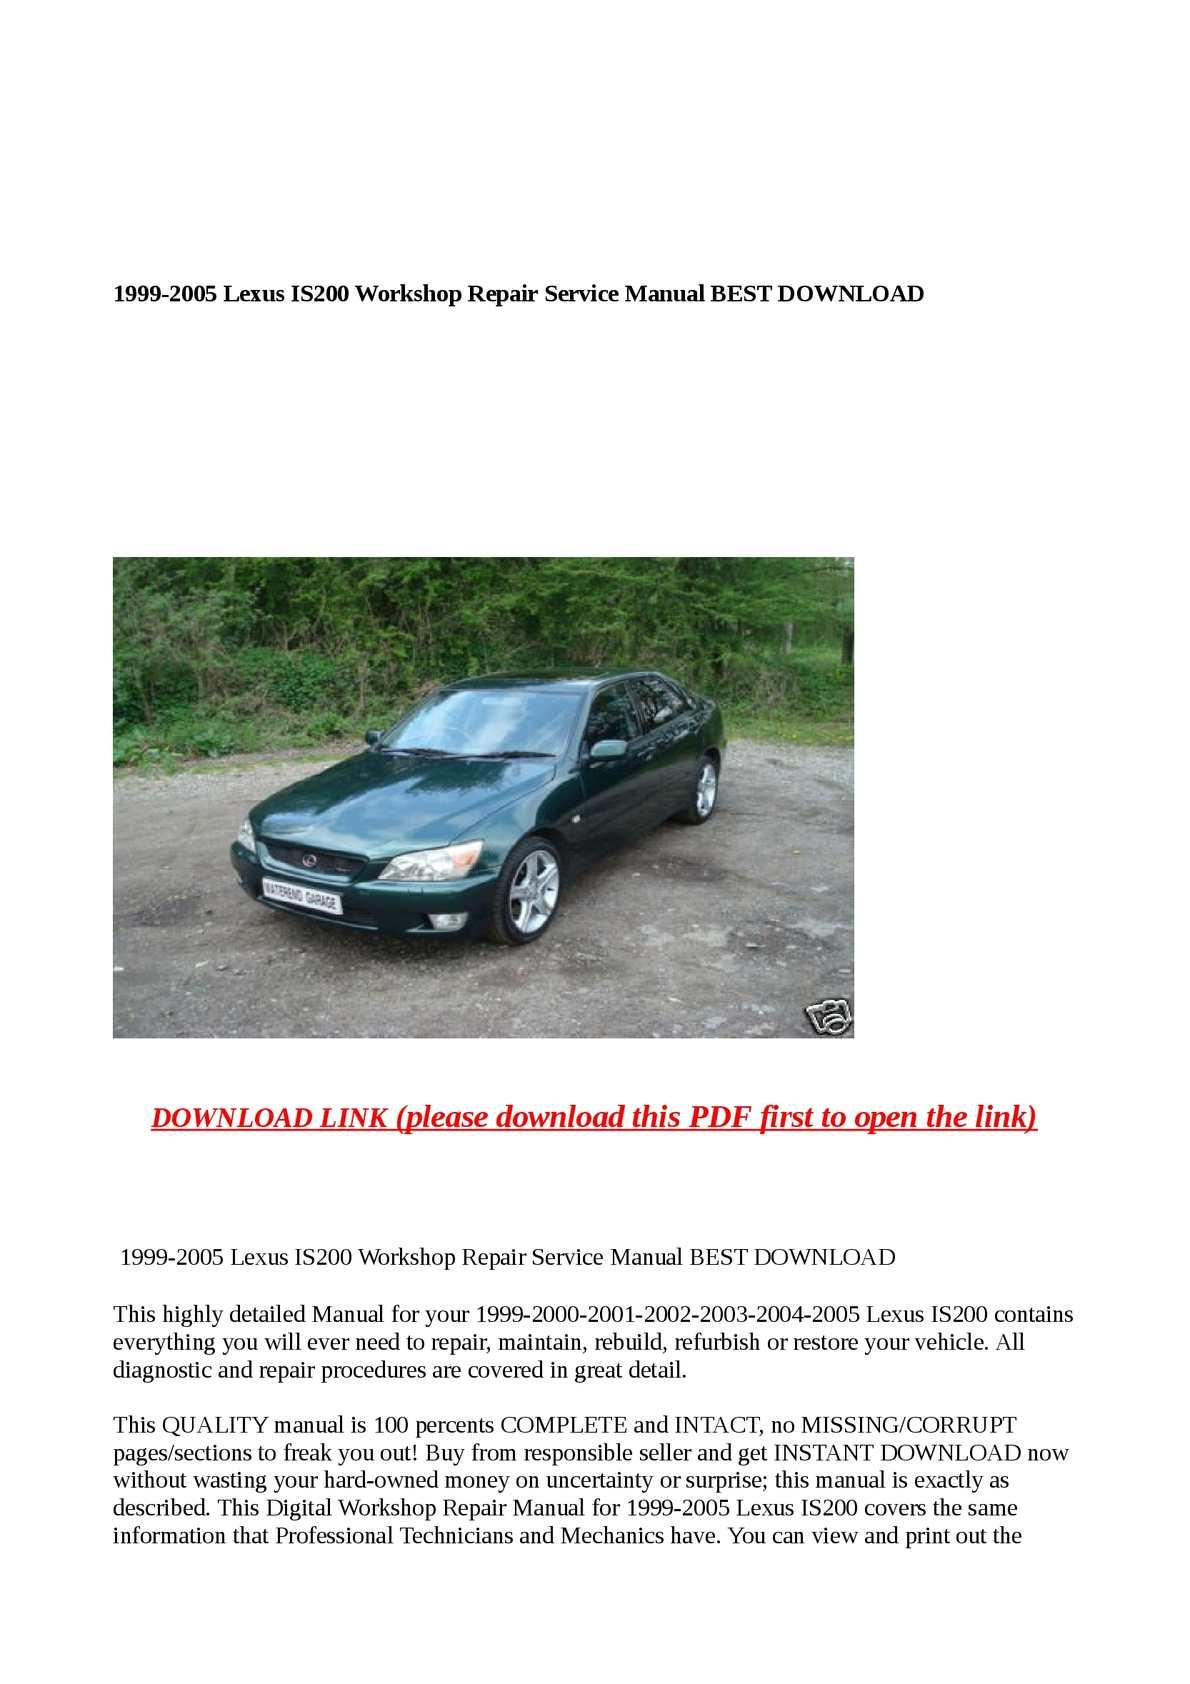 Calaméo - 1999-2005 Lexus IS200 Workshop Repair Service Manual BEST DOWNLOAD